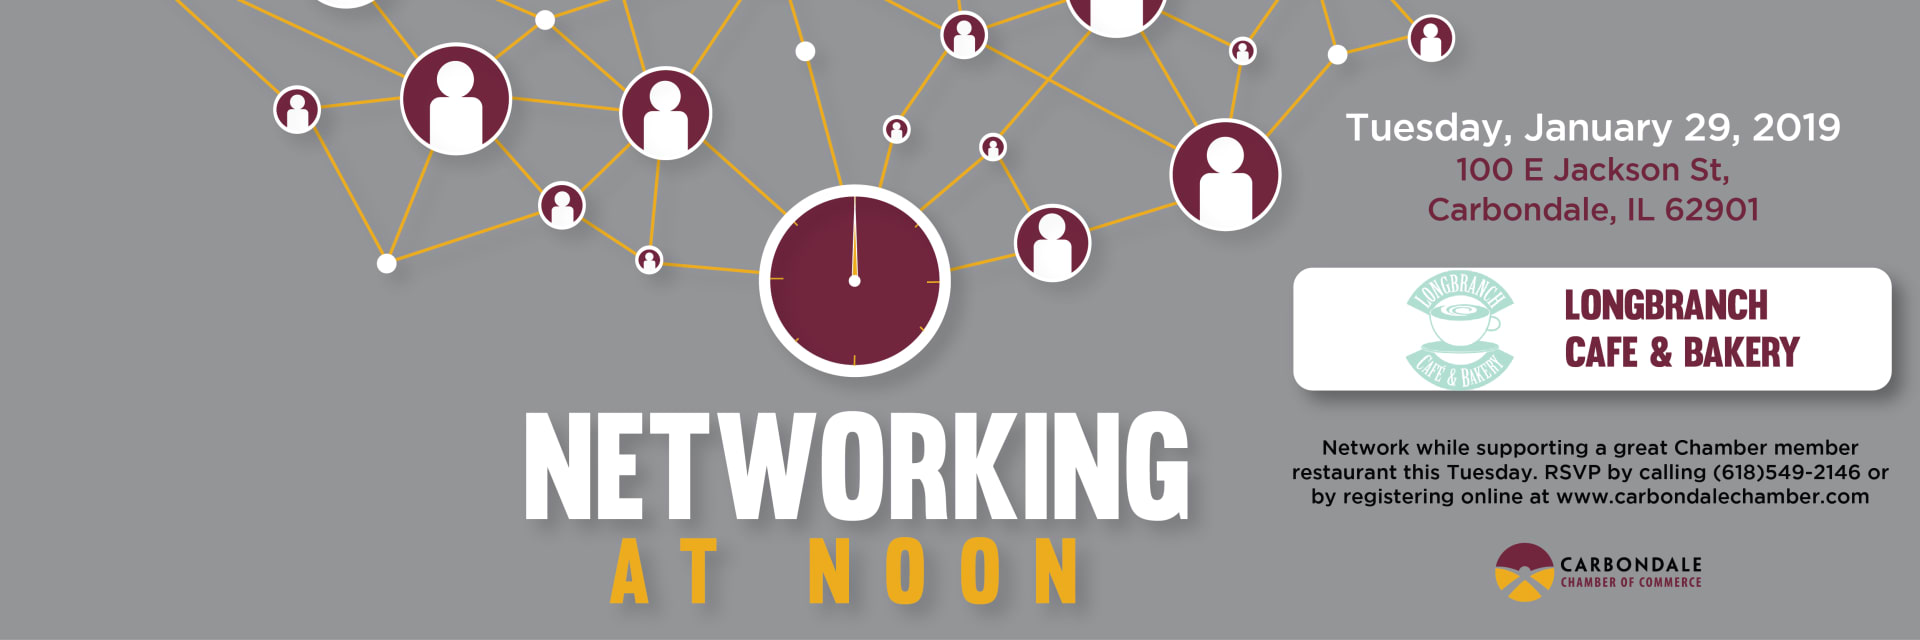 Networking-at-Noon_Jan_Slider-01-w1920.jpg